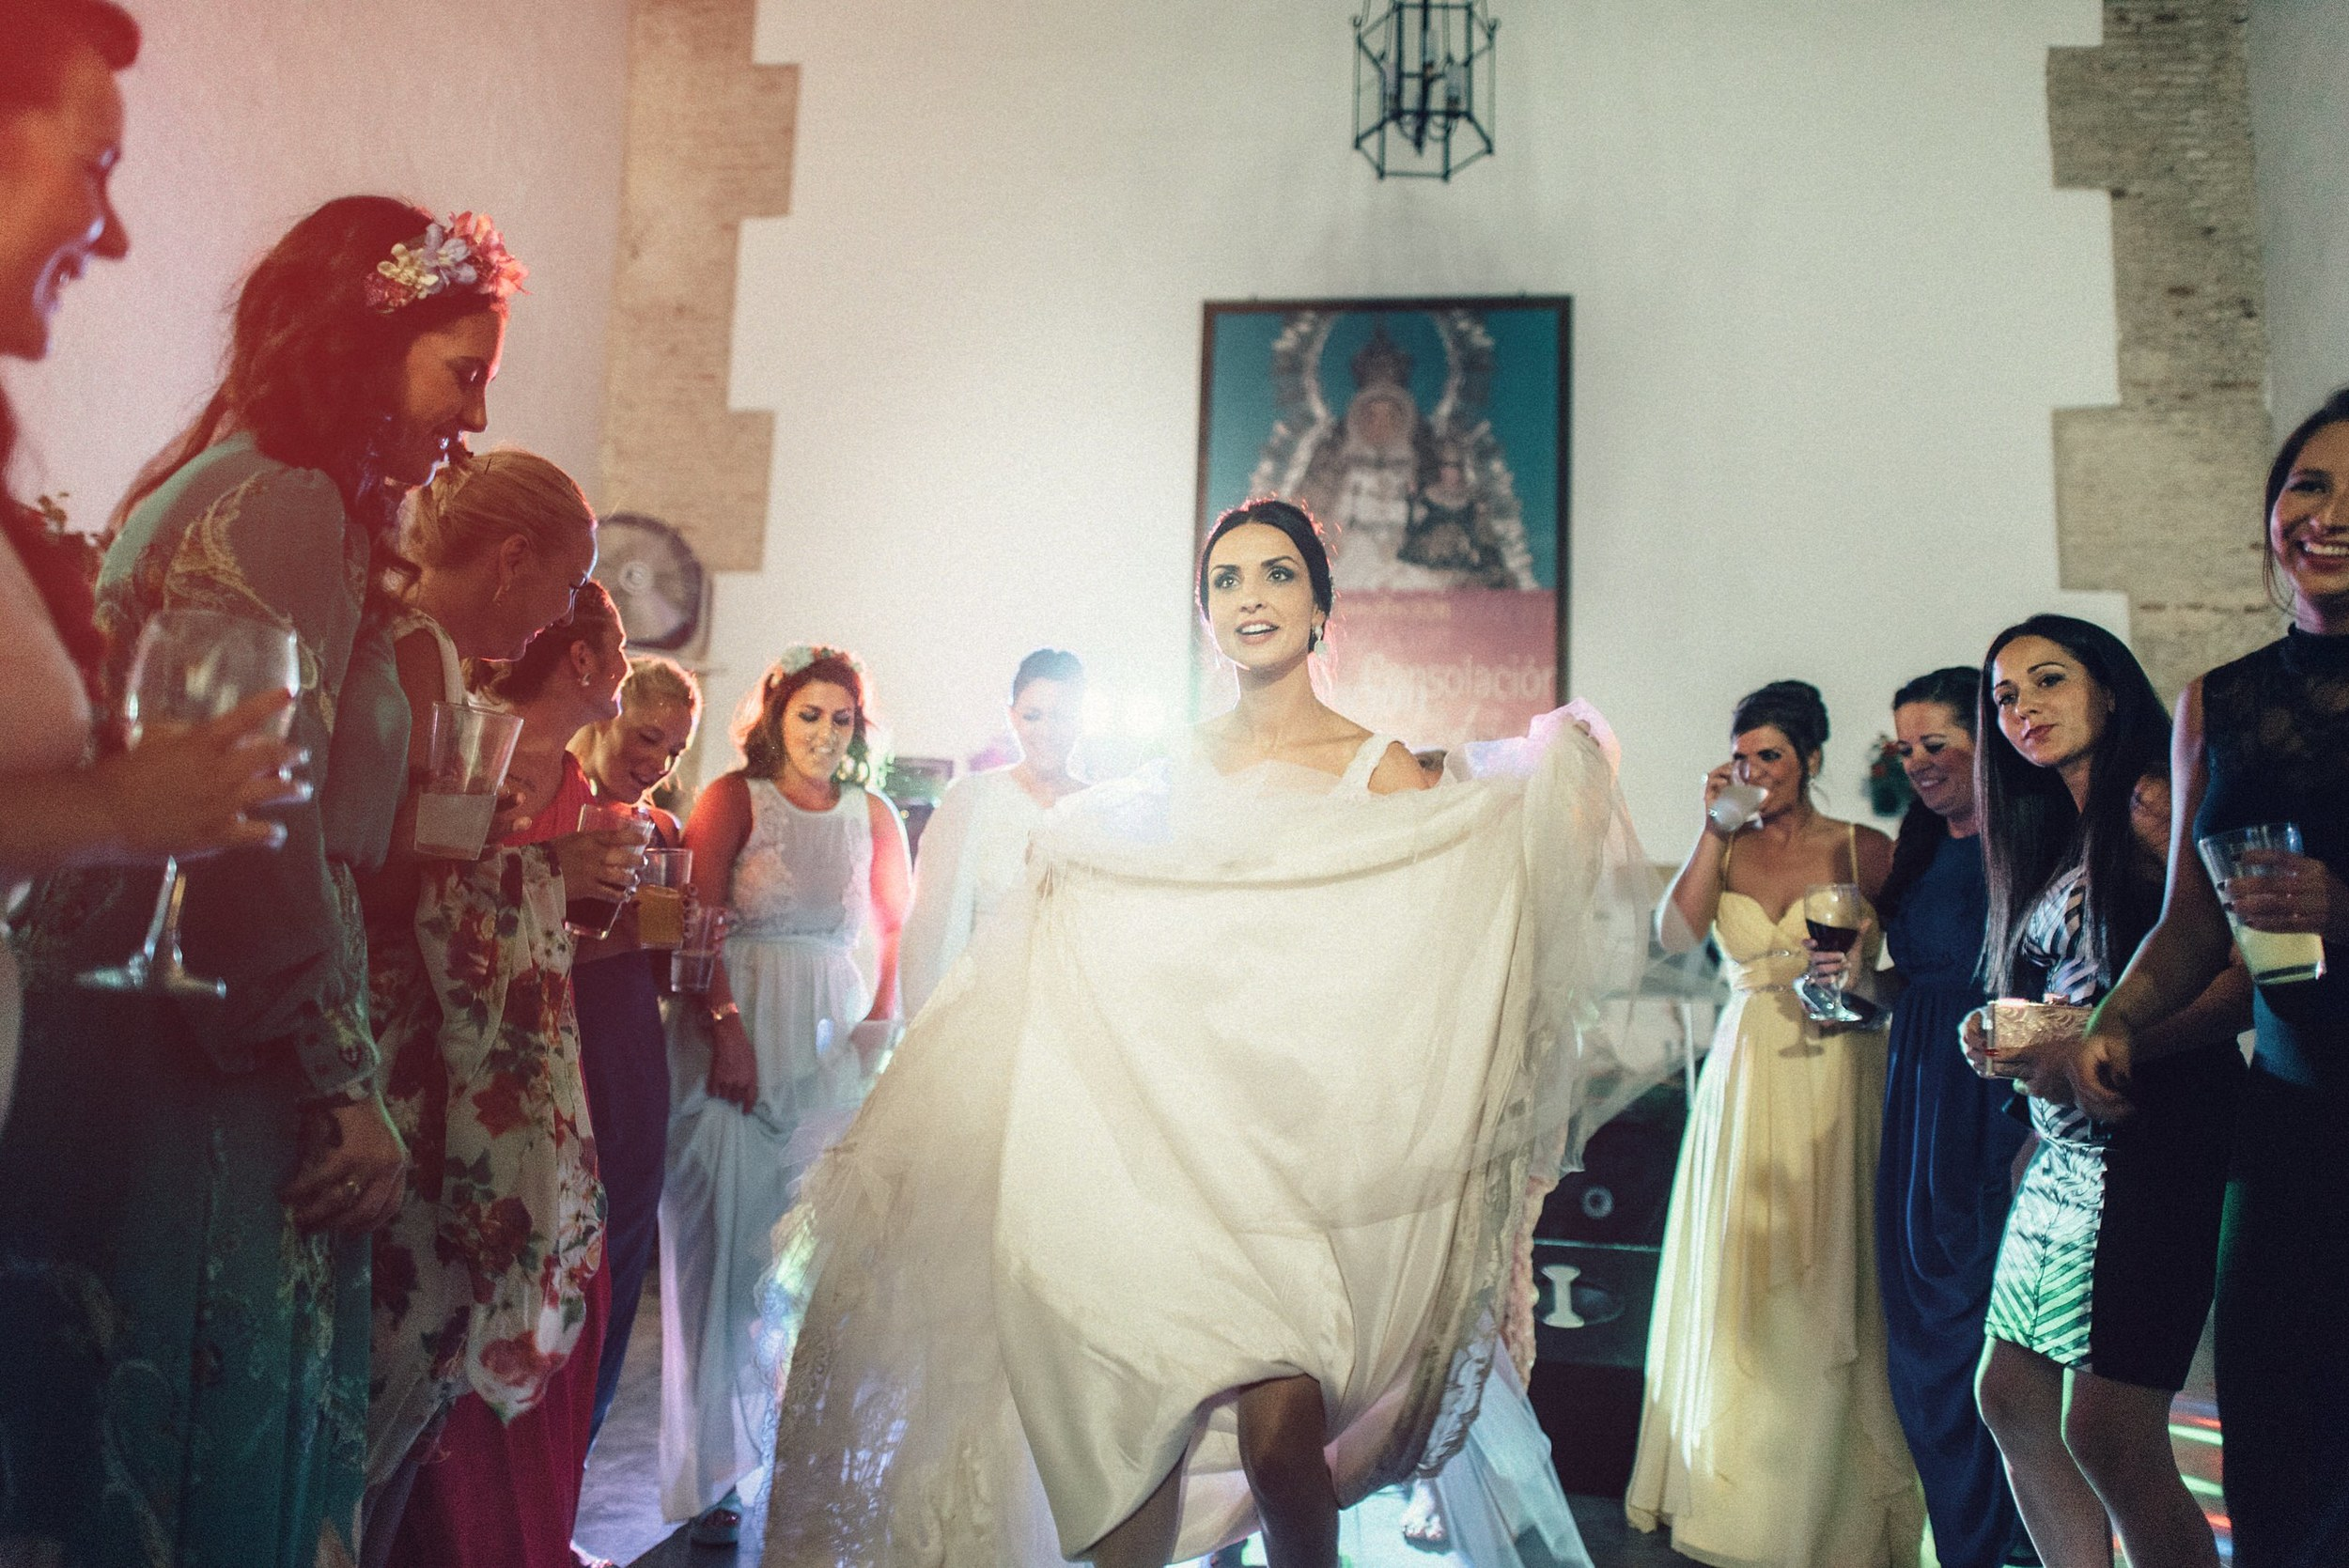 Boda en Utrera - Sevilla - Consolacion - Santuario - Alicia & Jesus DSC_5176exposure.jpg